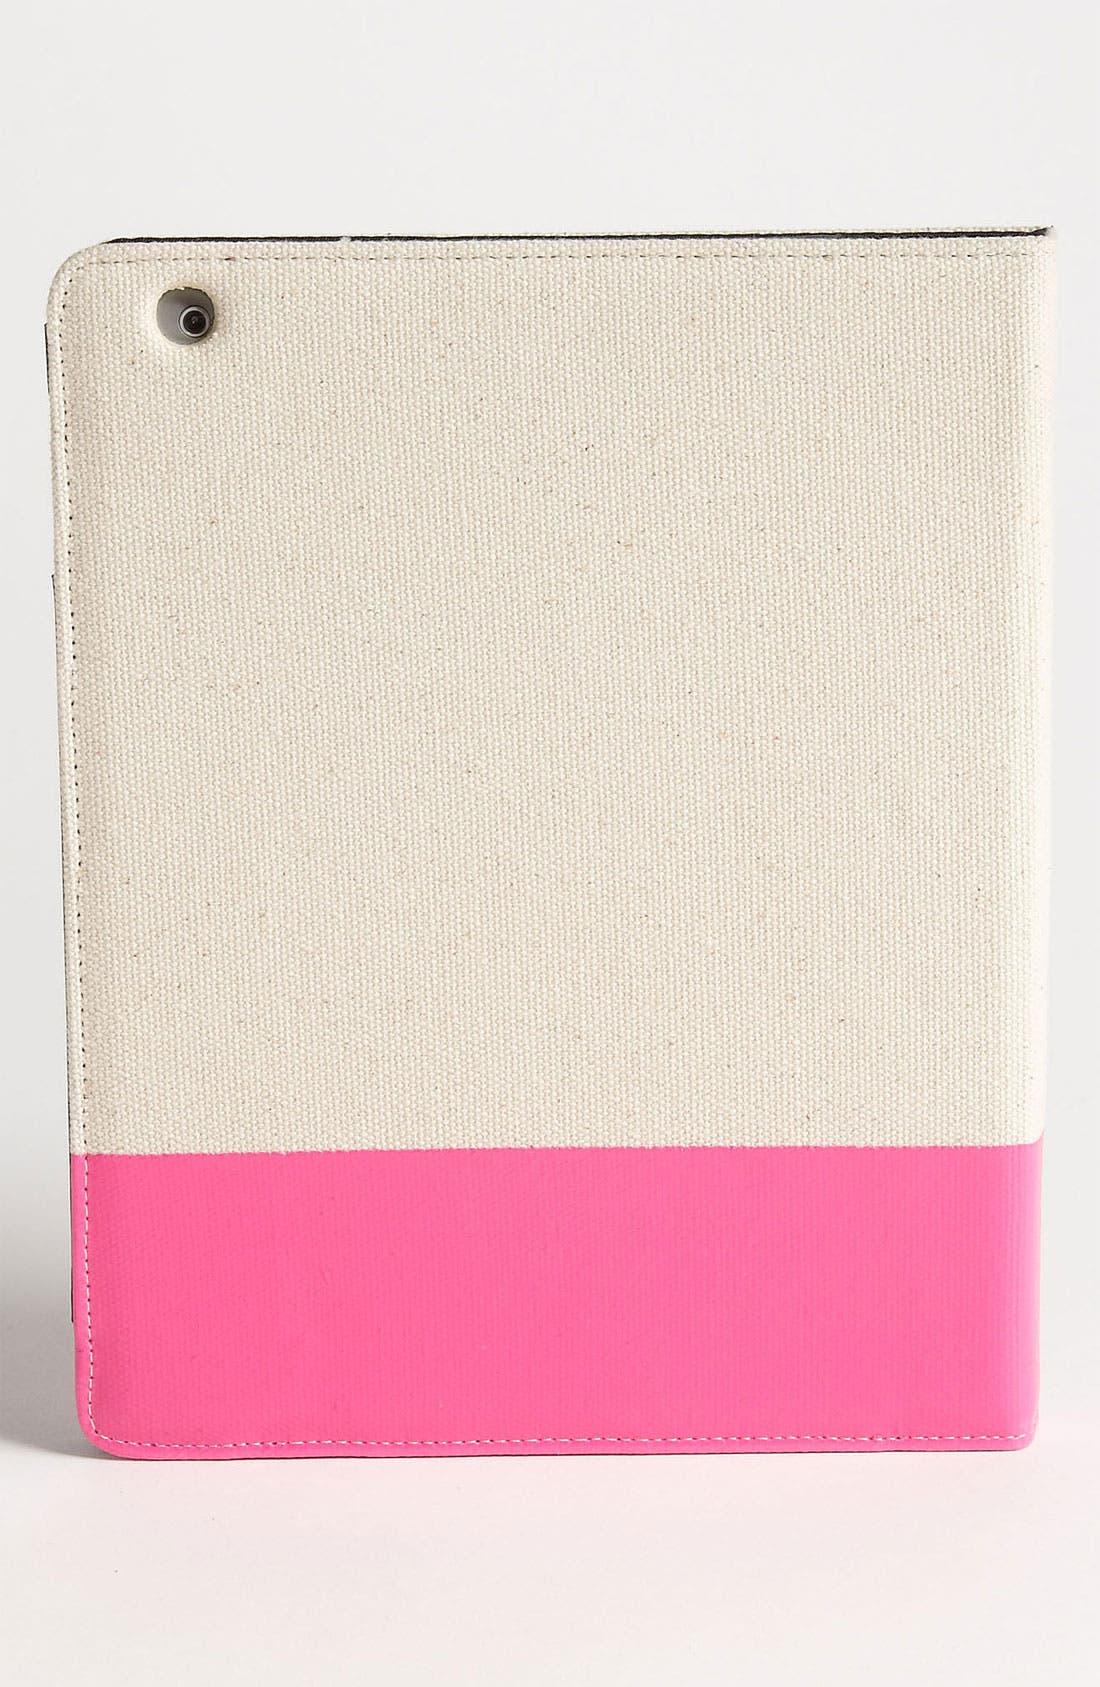 KATE SPADE NEW YORK,                             'mani pedi' iPad 2 & 3 folio,                             Alternate thumbnail 4, color,                             101